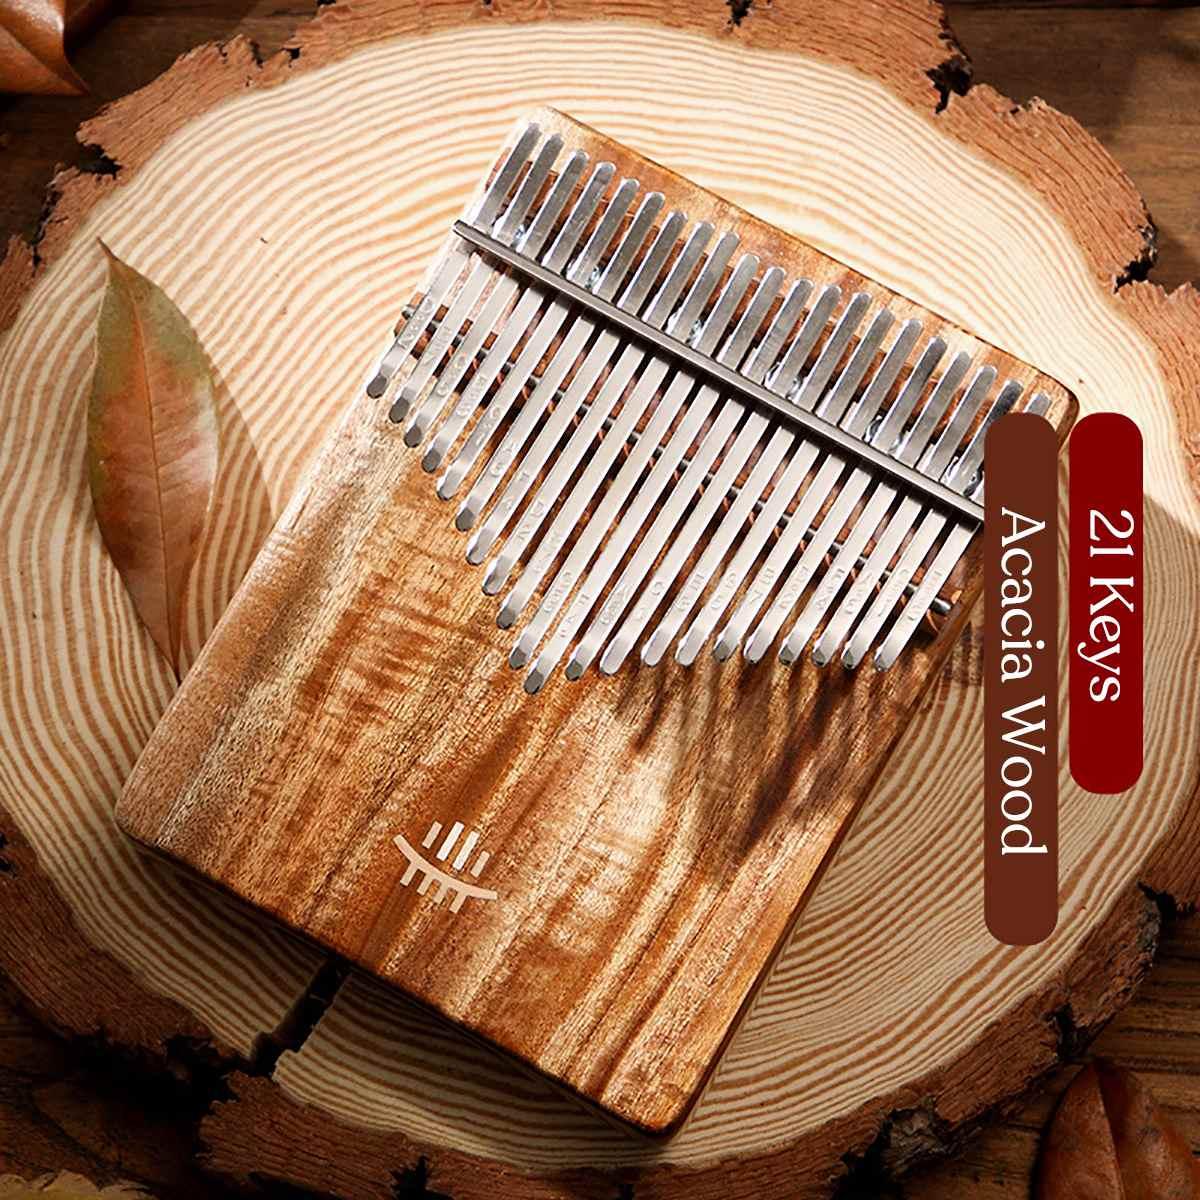 Kalimba 21 Schlüssel Klavier Finger Holz Festen Bord Unteren Mbira Acacia Musical Instrument für Anfänger Calimba Kinder Weihnachten Geschenk